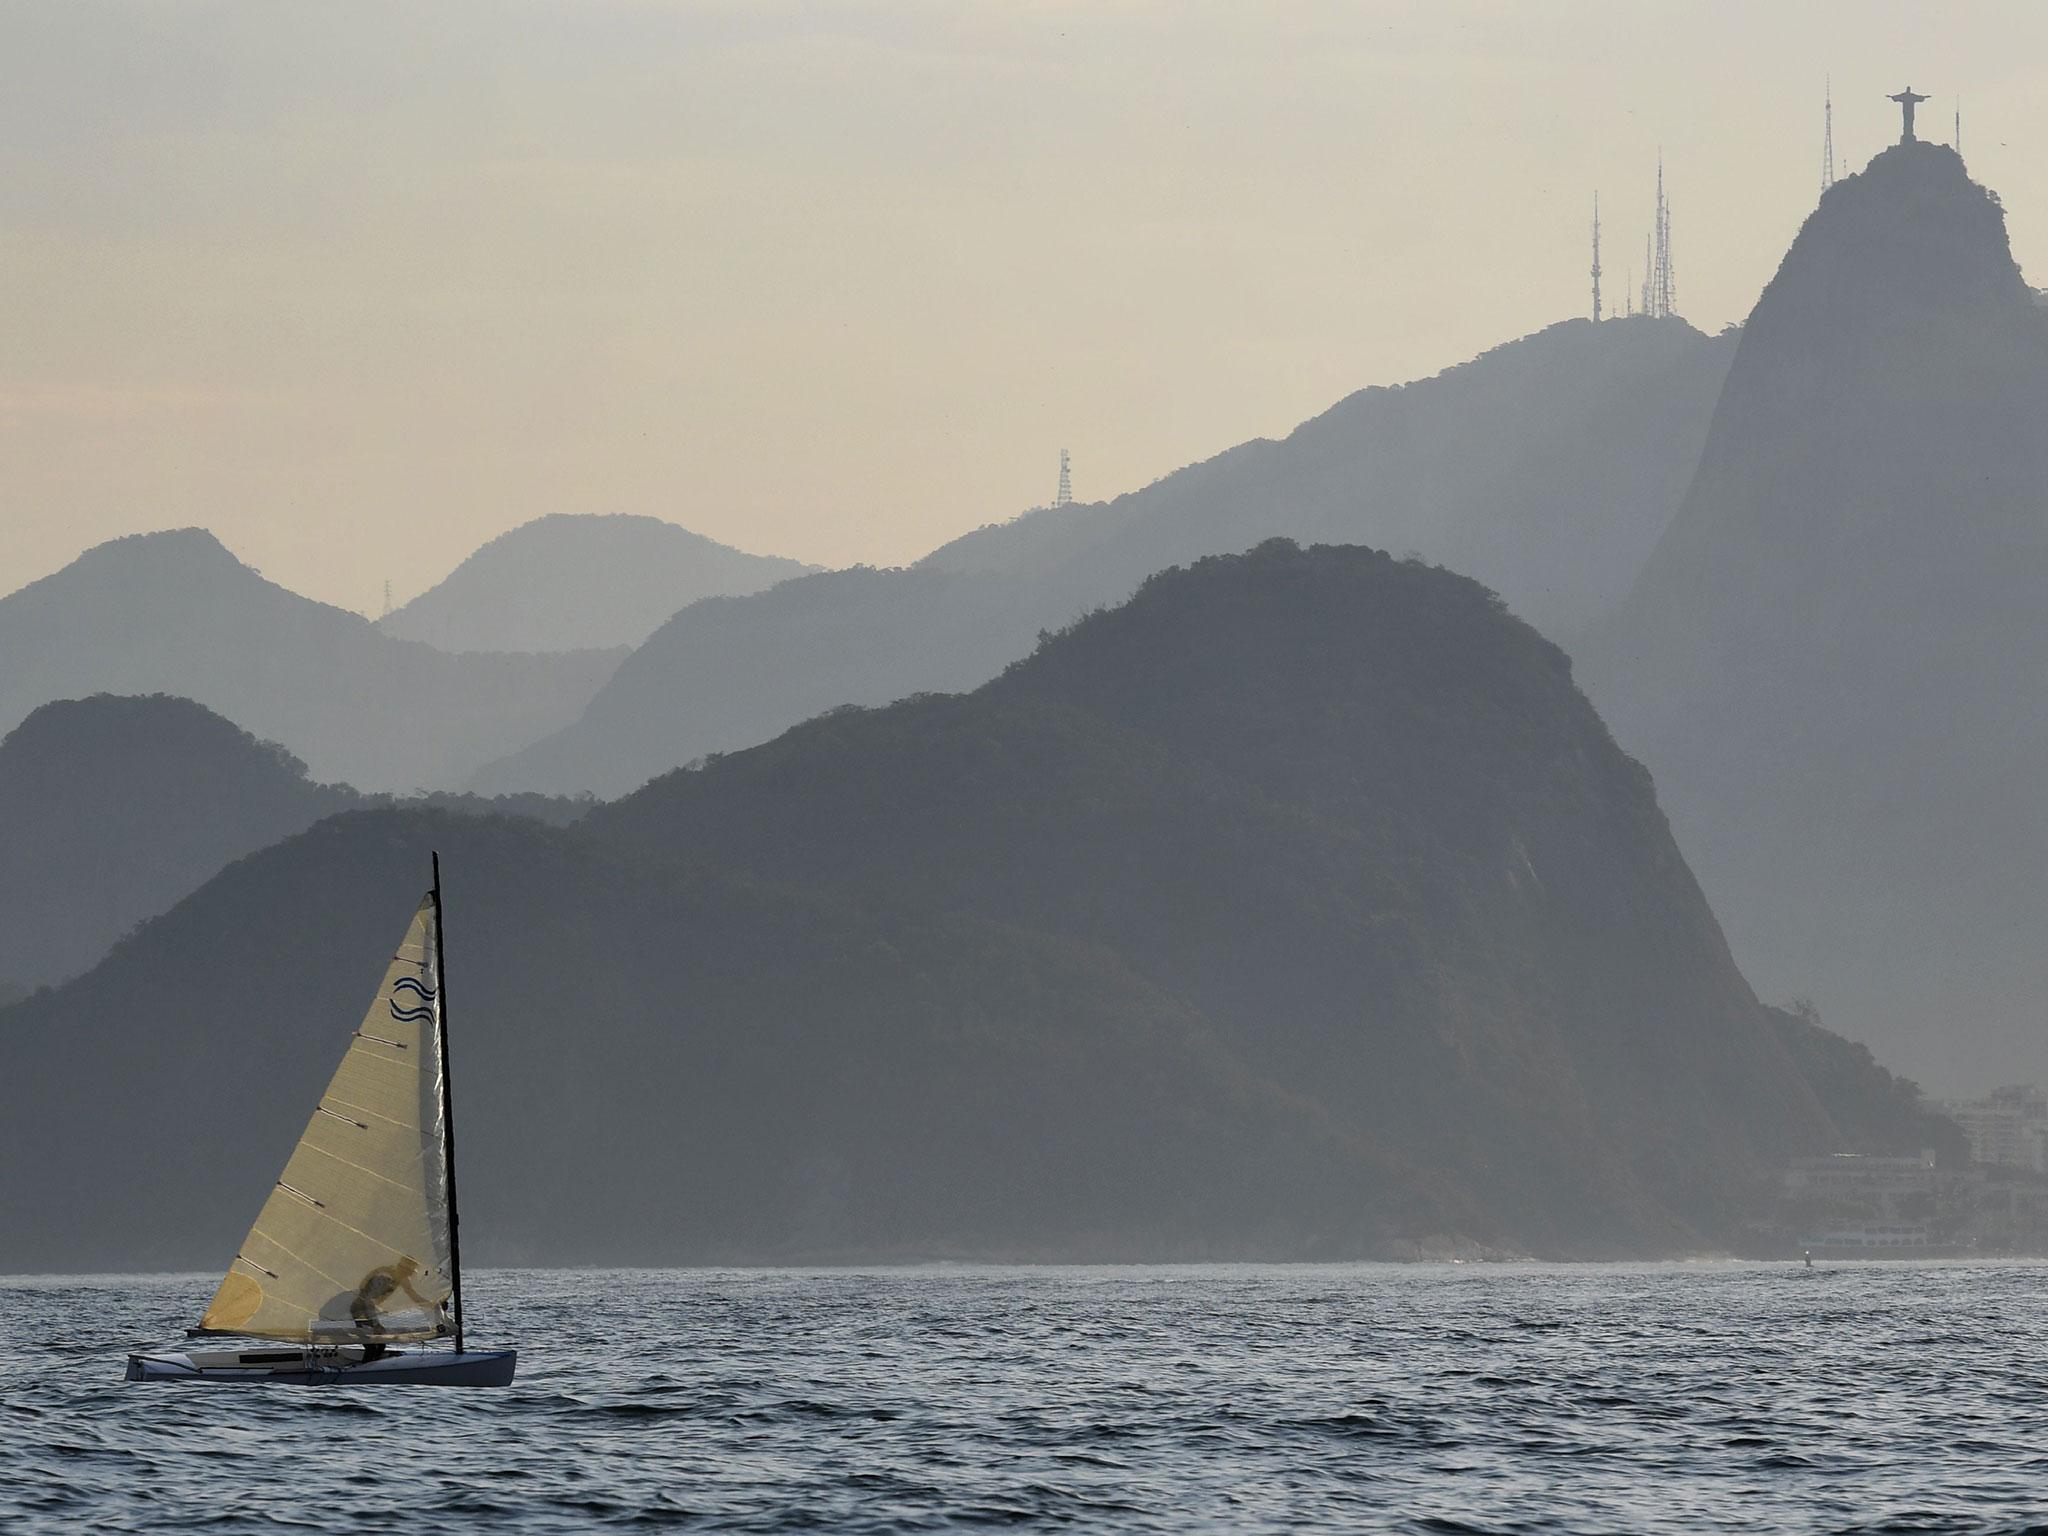 Rio 2016: Severed leg found in Guanabara Bay near sailing event